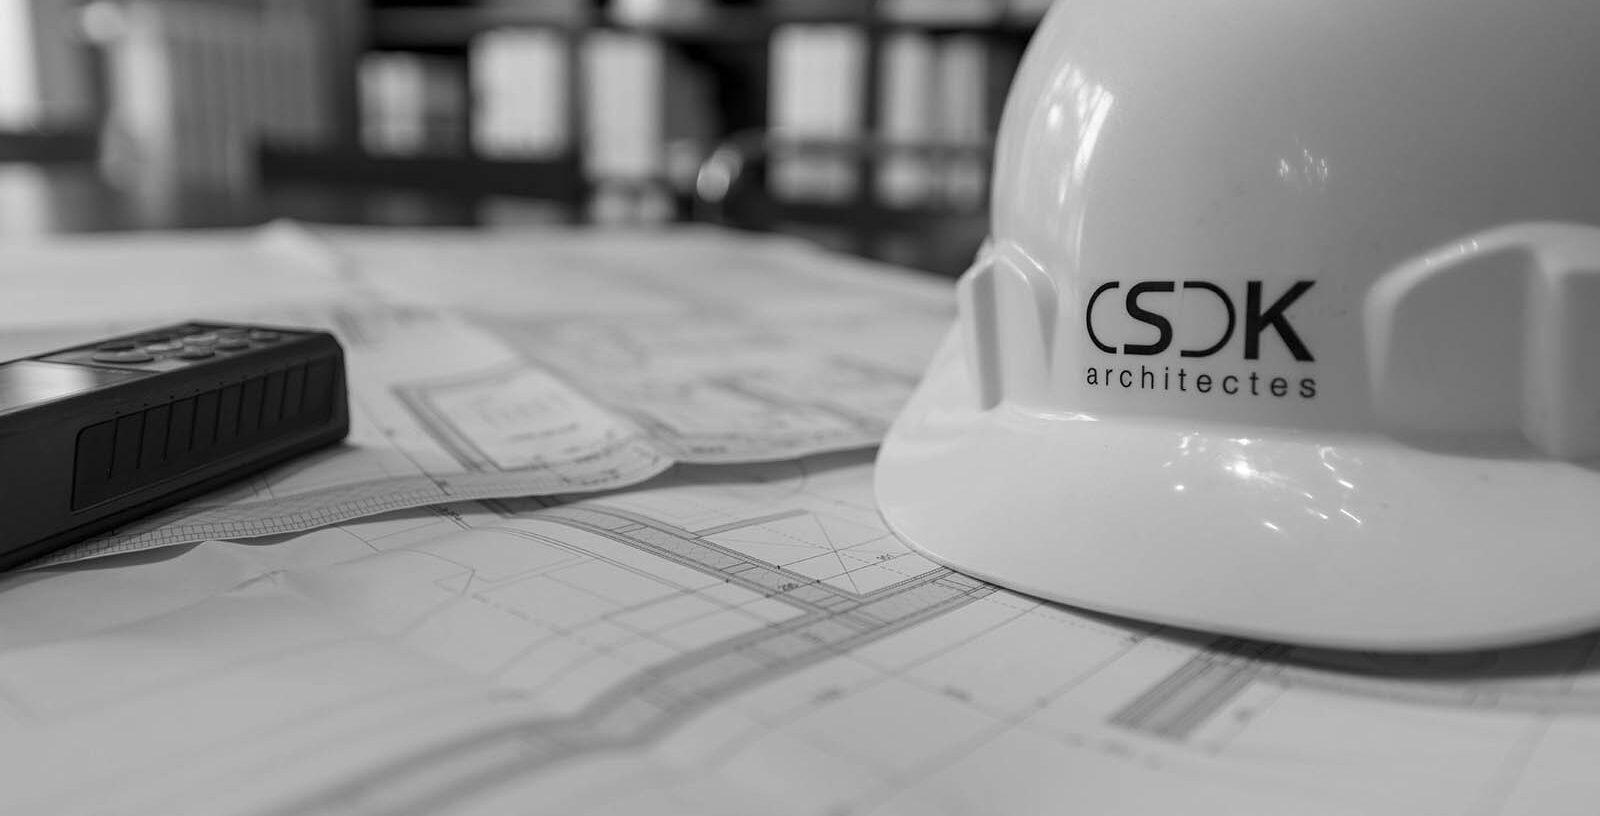 CSDK Architectes bureau darchitectes emplois e1563525592281 1600x816 - Job offer - CSDK Architectes bureau darchitectes emplois e1563525592281 1600x816